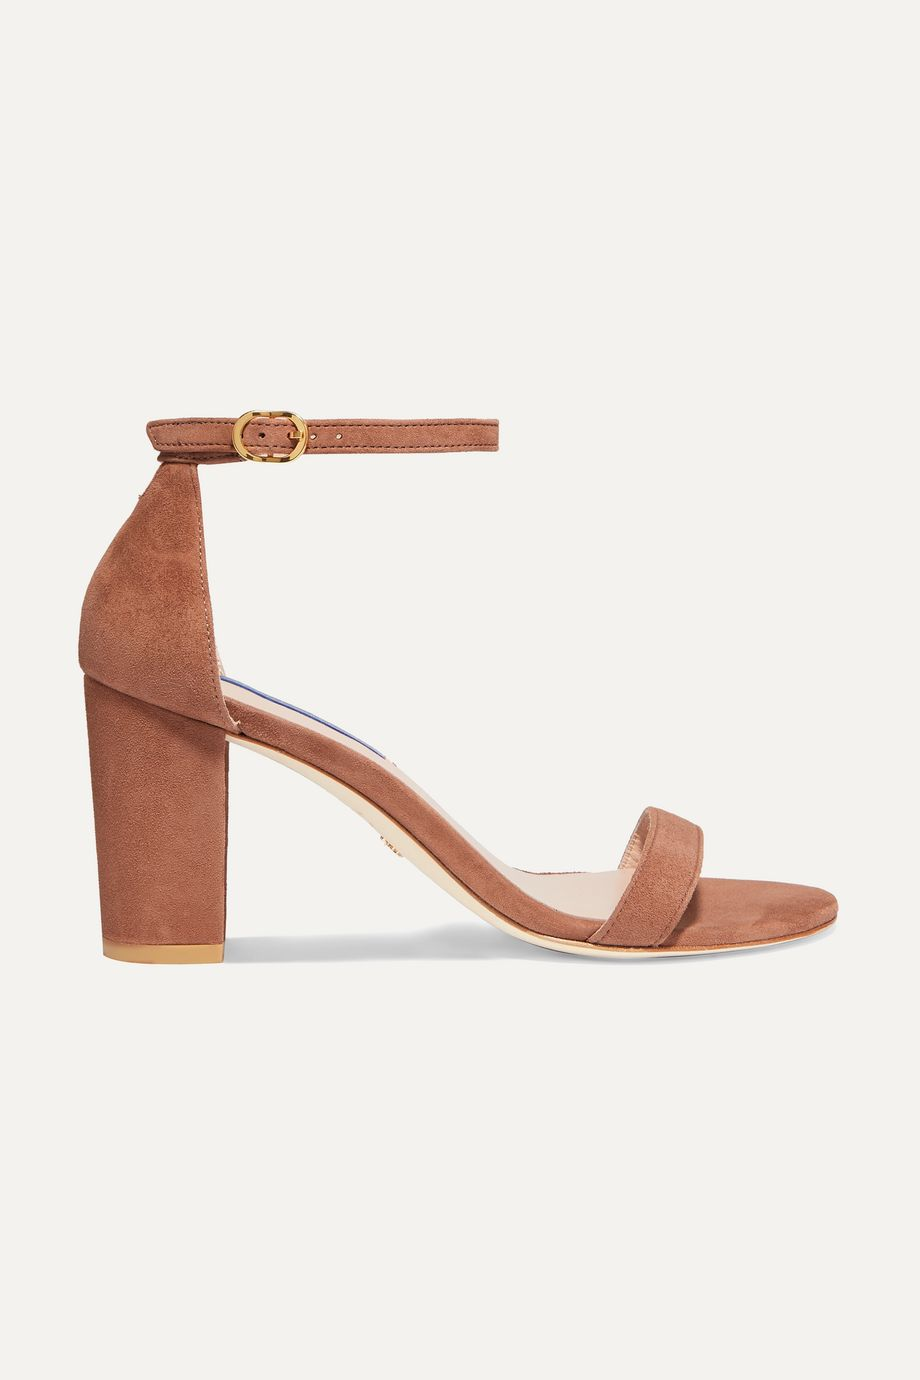 Stuart Weitzman NearlyNude suede sandals